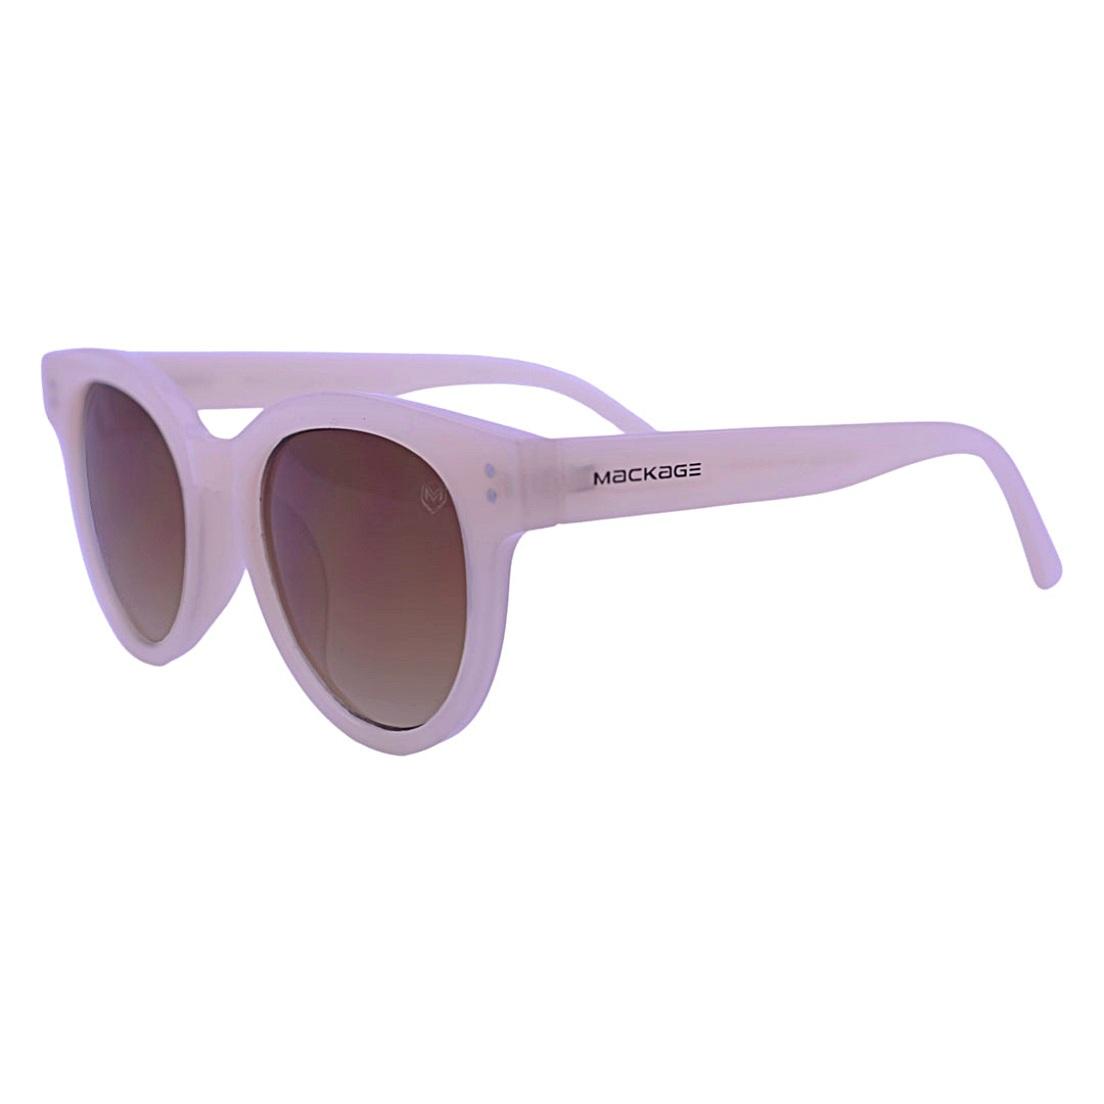 Óculos De Sol Mackage Feminino Acetato Gateado Retro - Rosa Palha